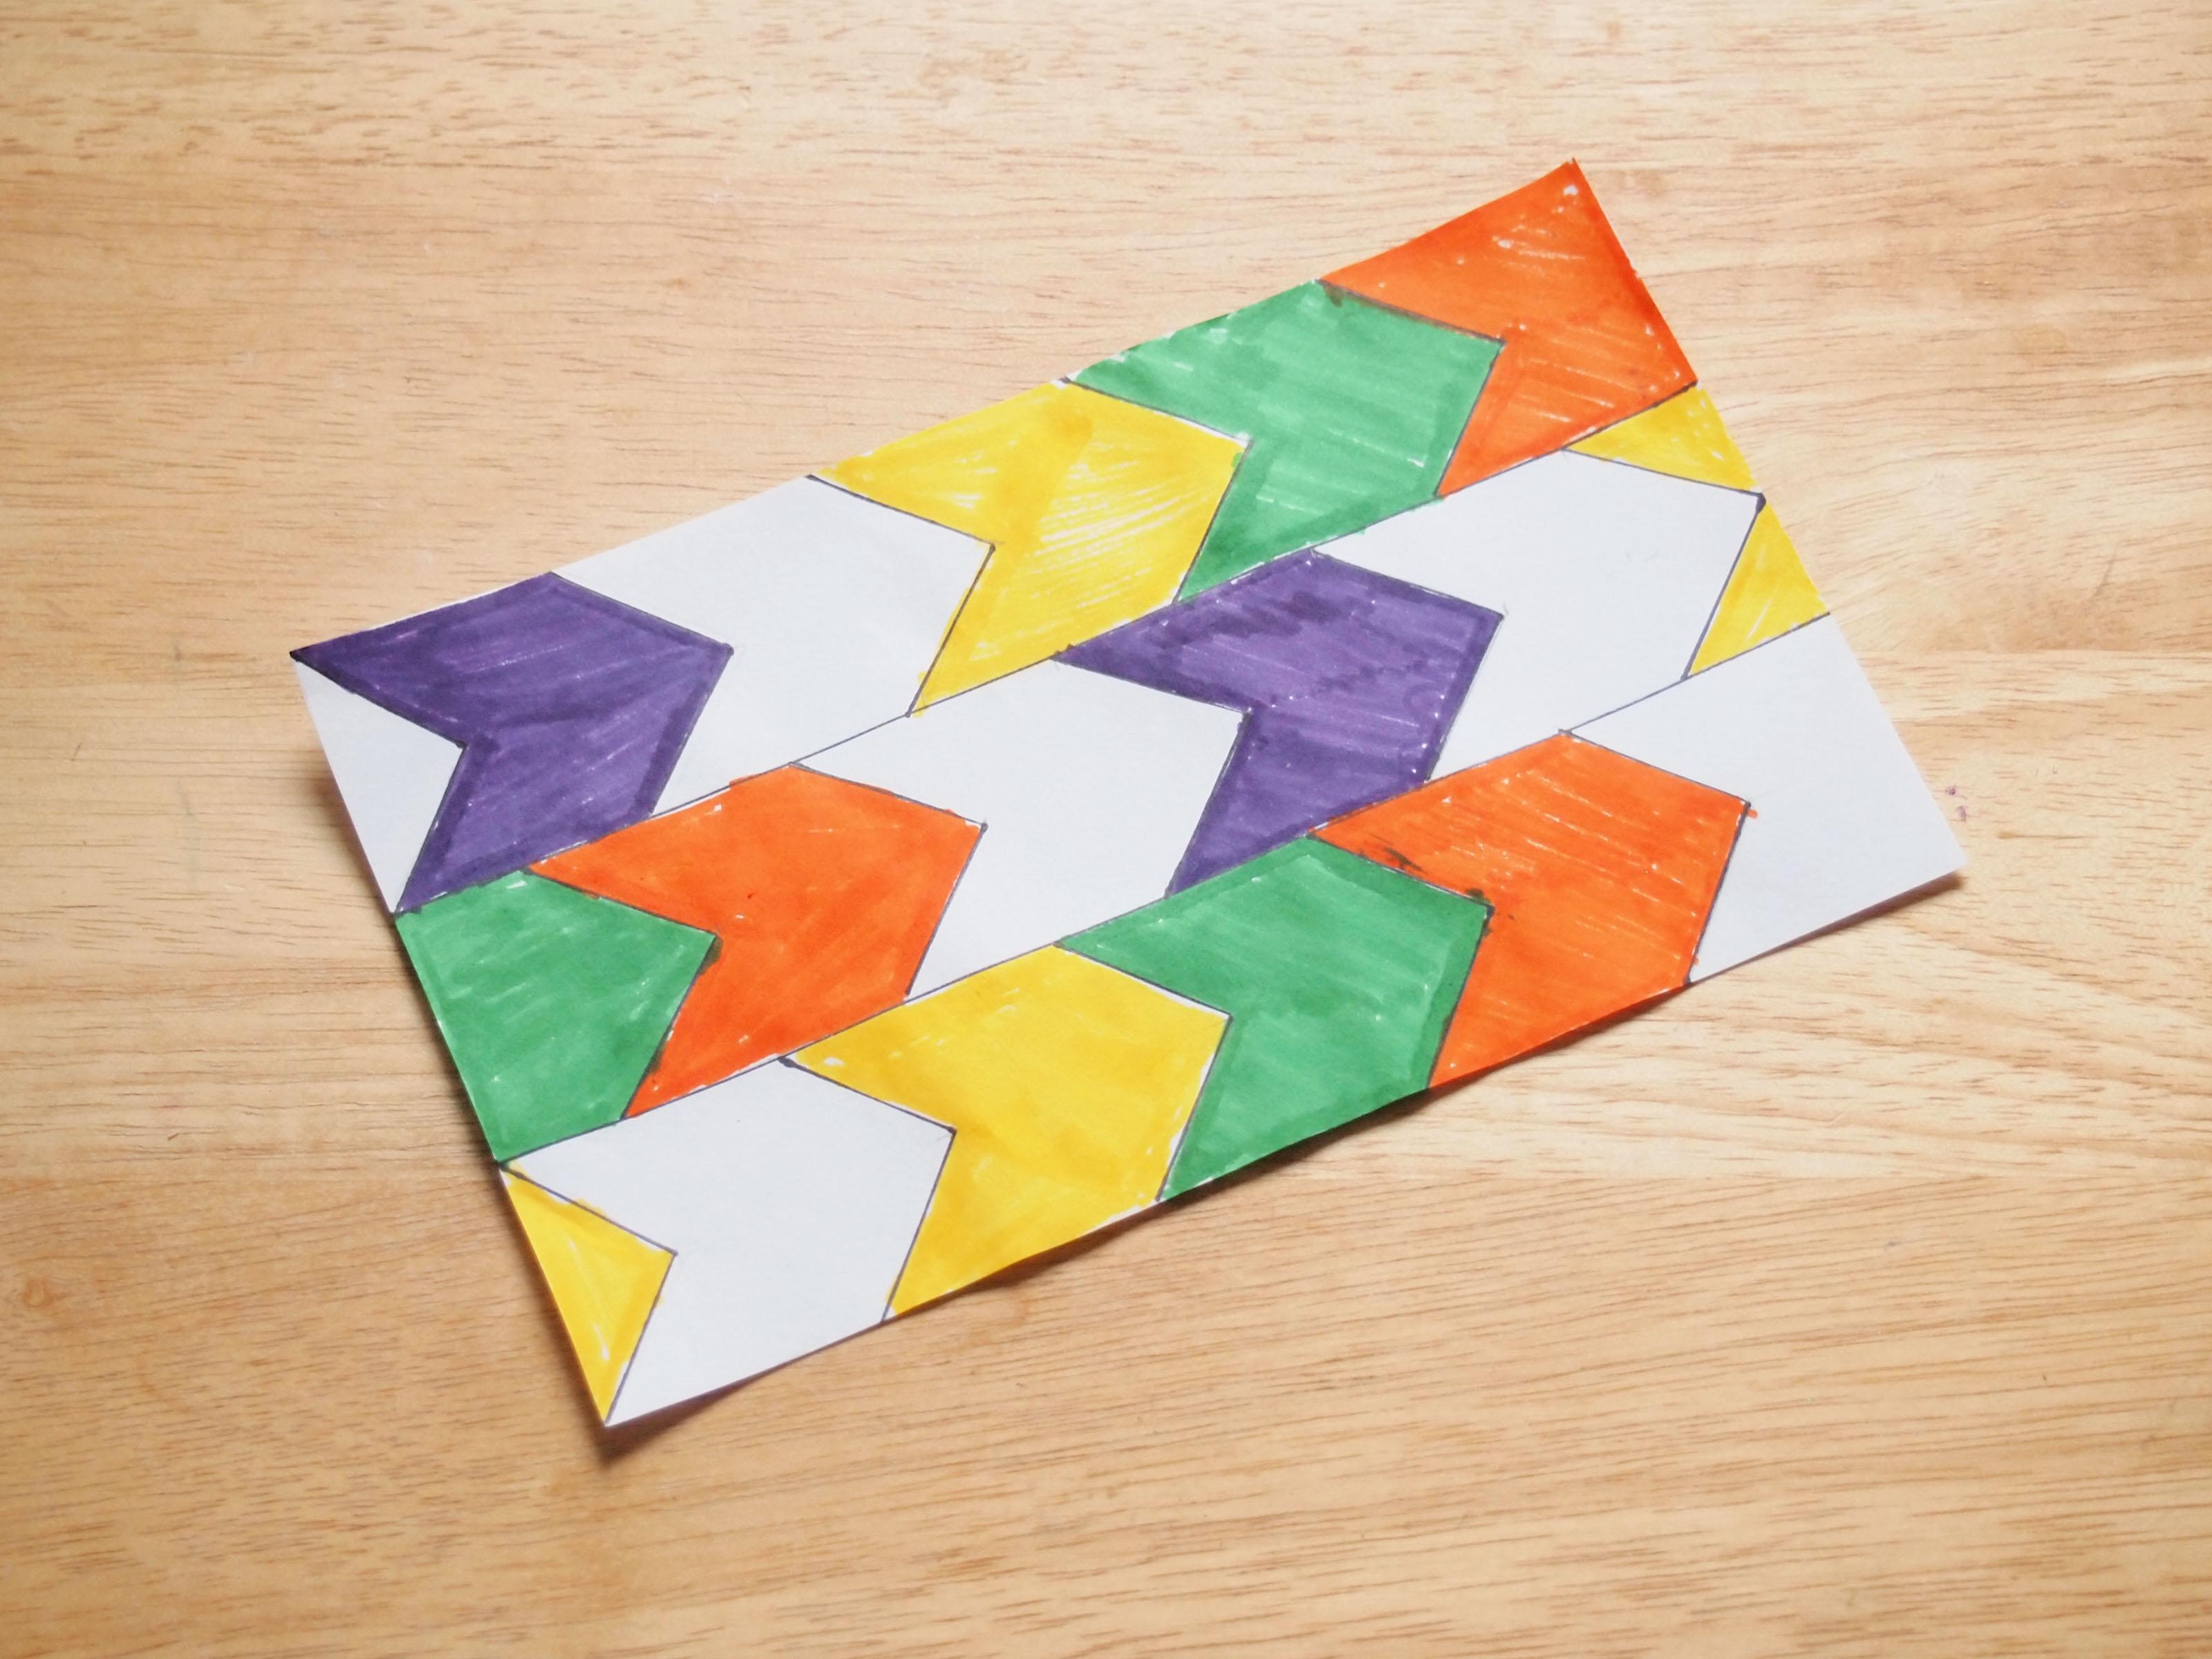 How To Make A Translation Tessellation 8 Steps With